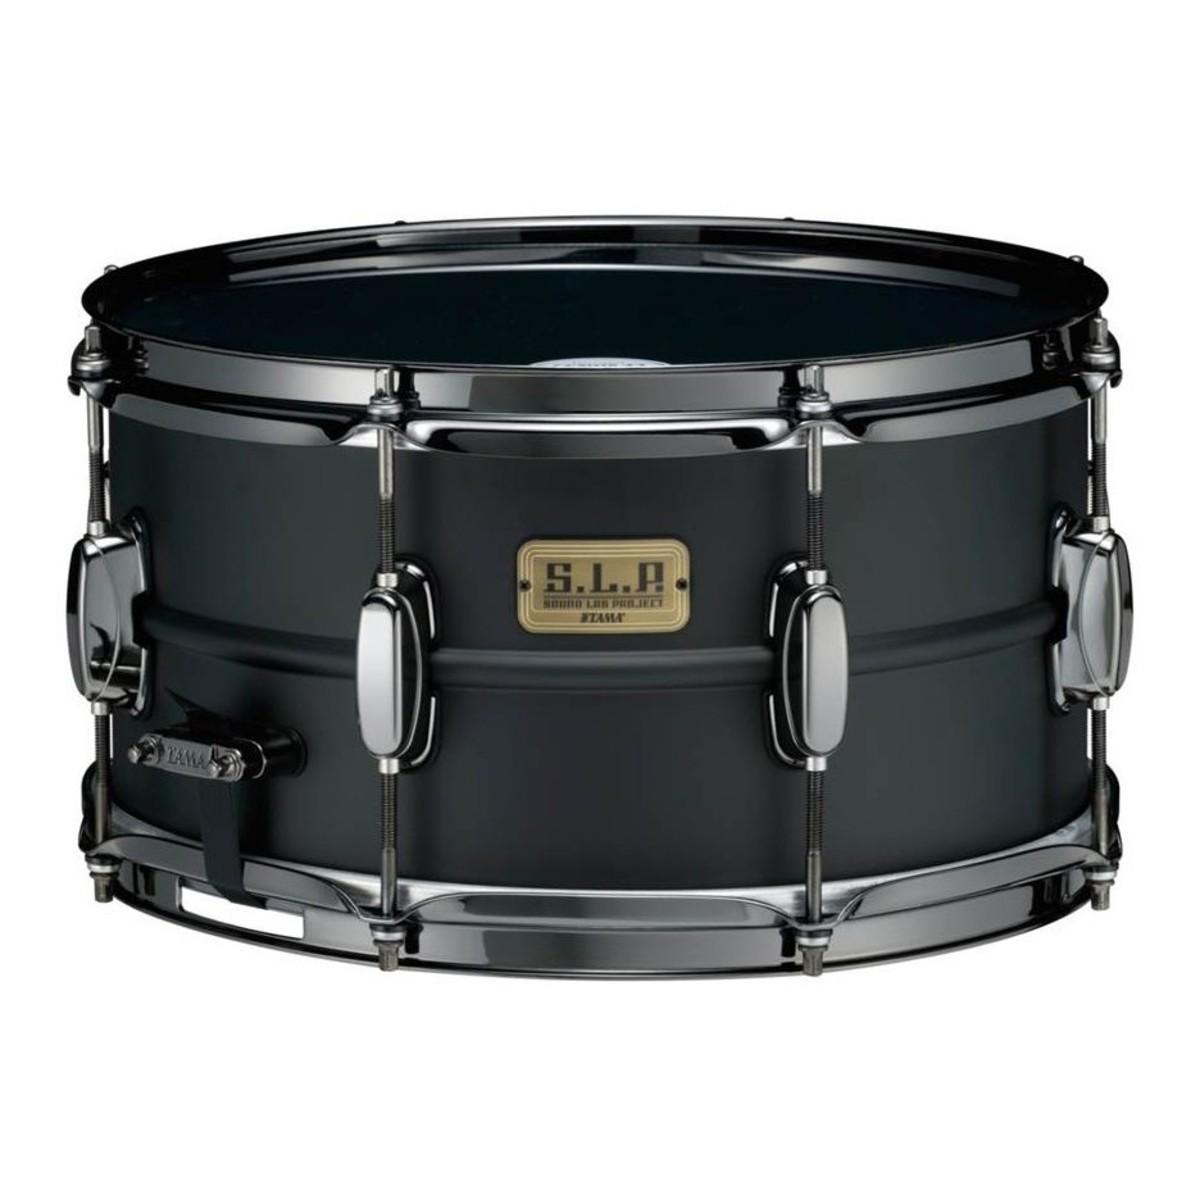 Tama SLP 13\'\' x 7\'\' Big Black Steel Snare Drum, Matte Black bei ...